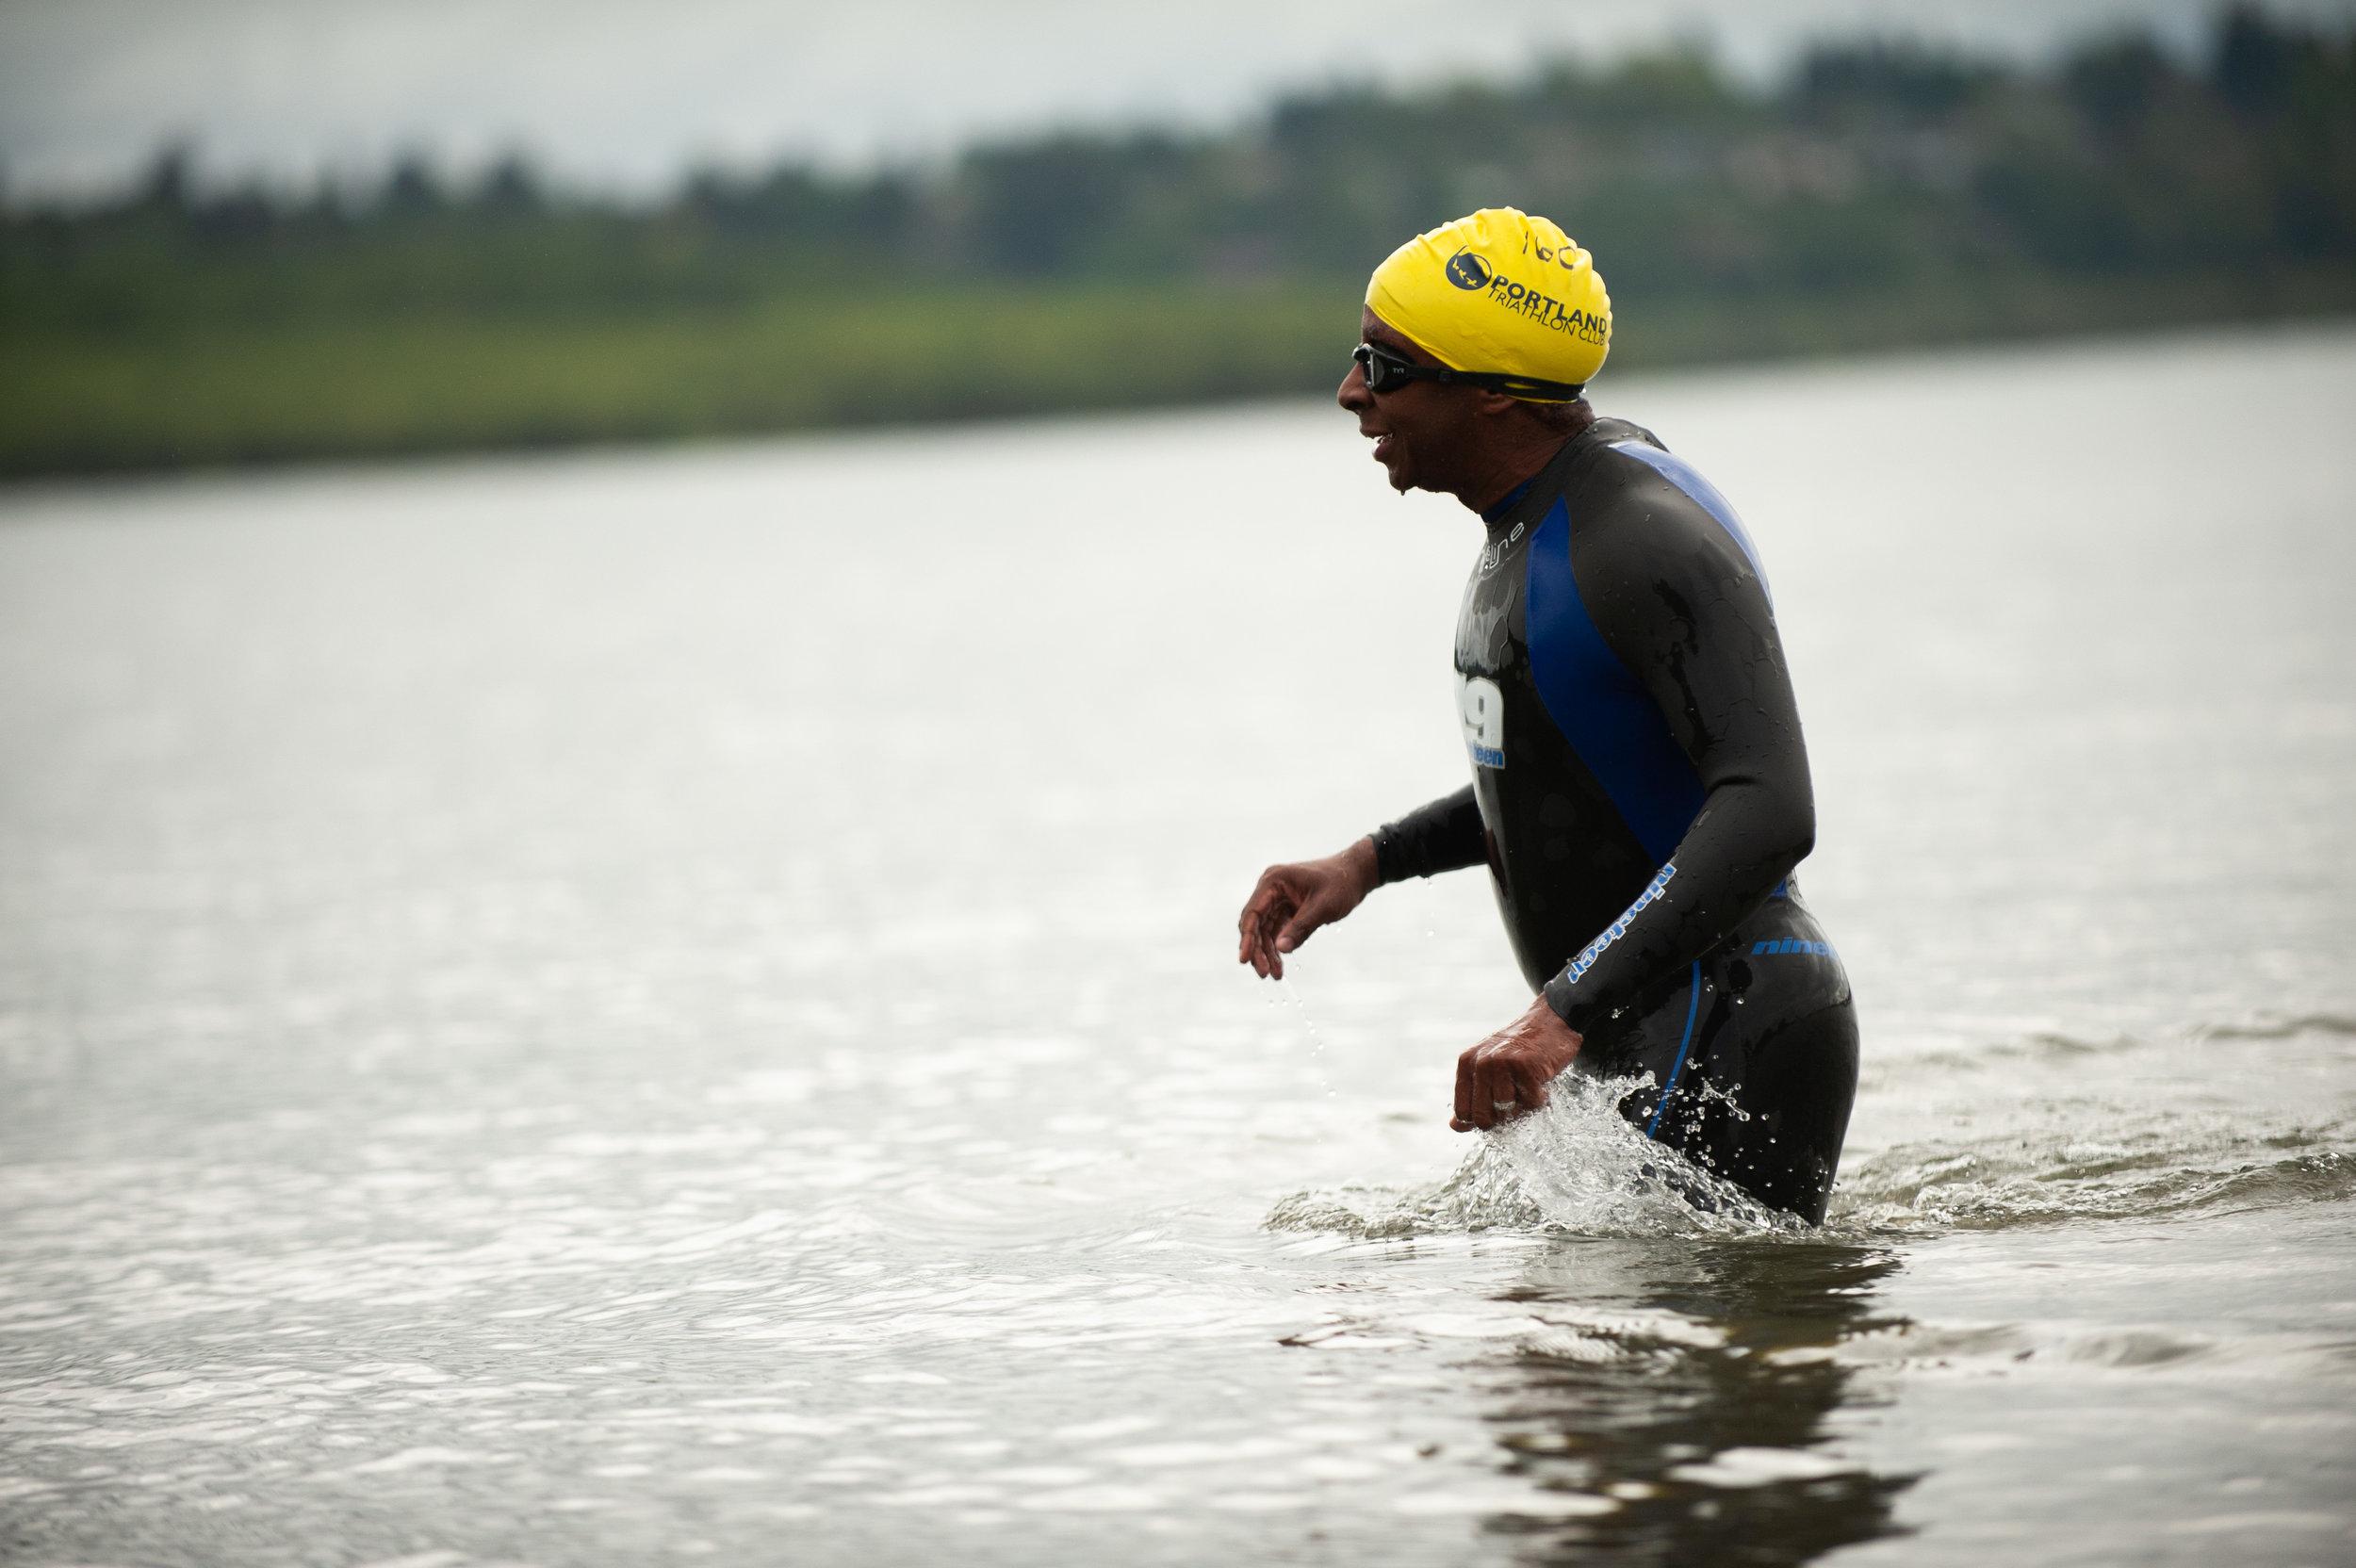 CBCG athlete Morgan Spriggs, photo: Darcie Elliott Photography